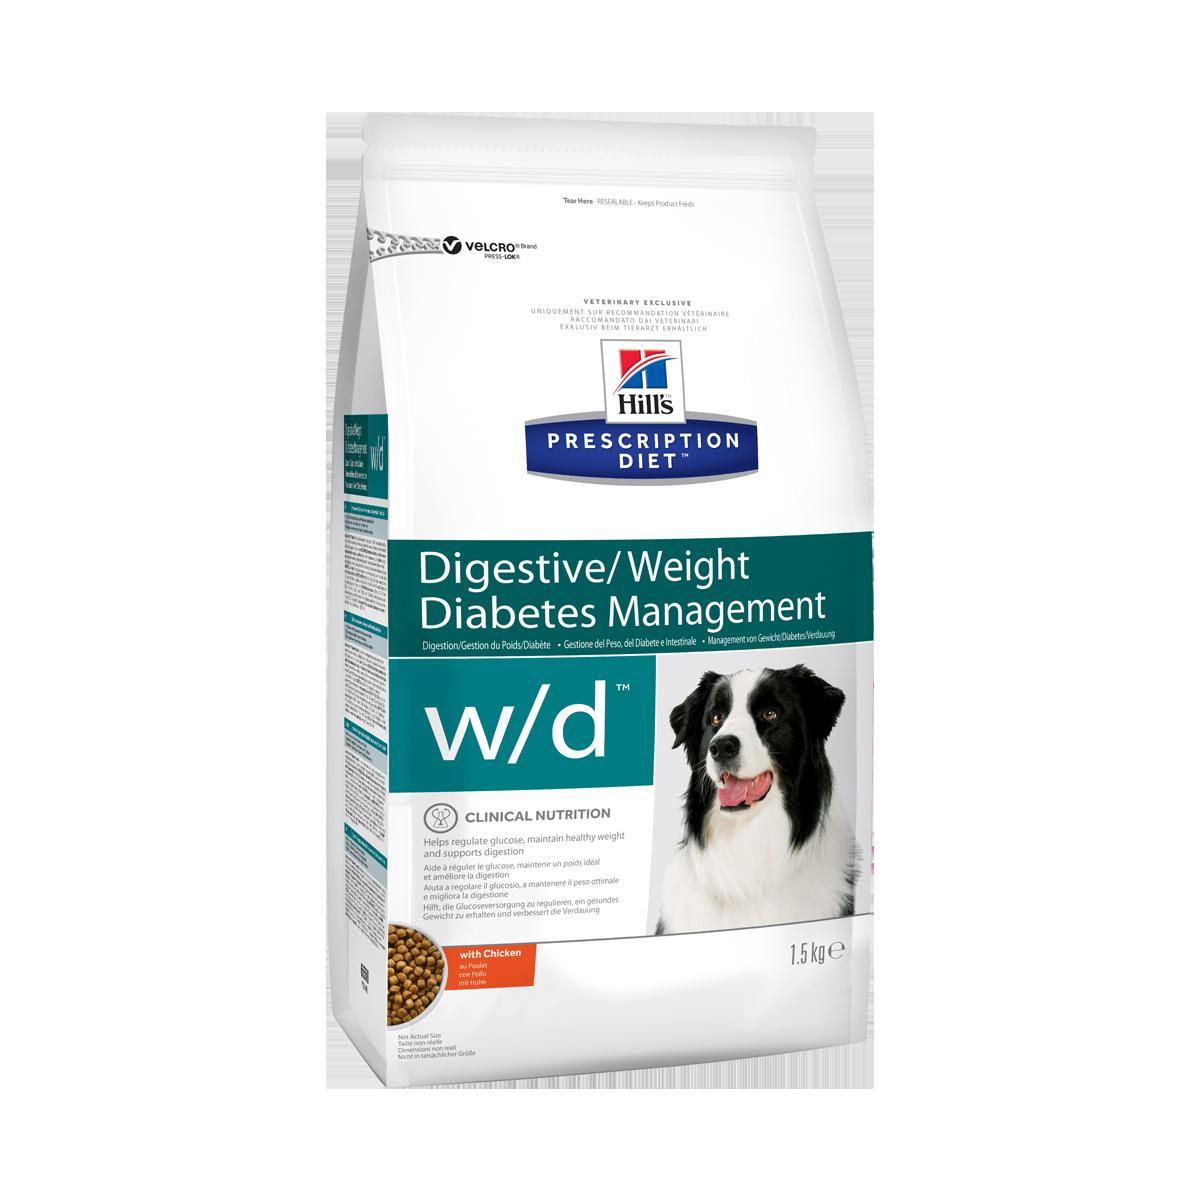 Hill's PD w/d Корм-диета для собак для поддержания оптимального веса при диабете